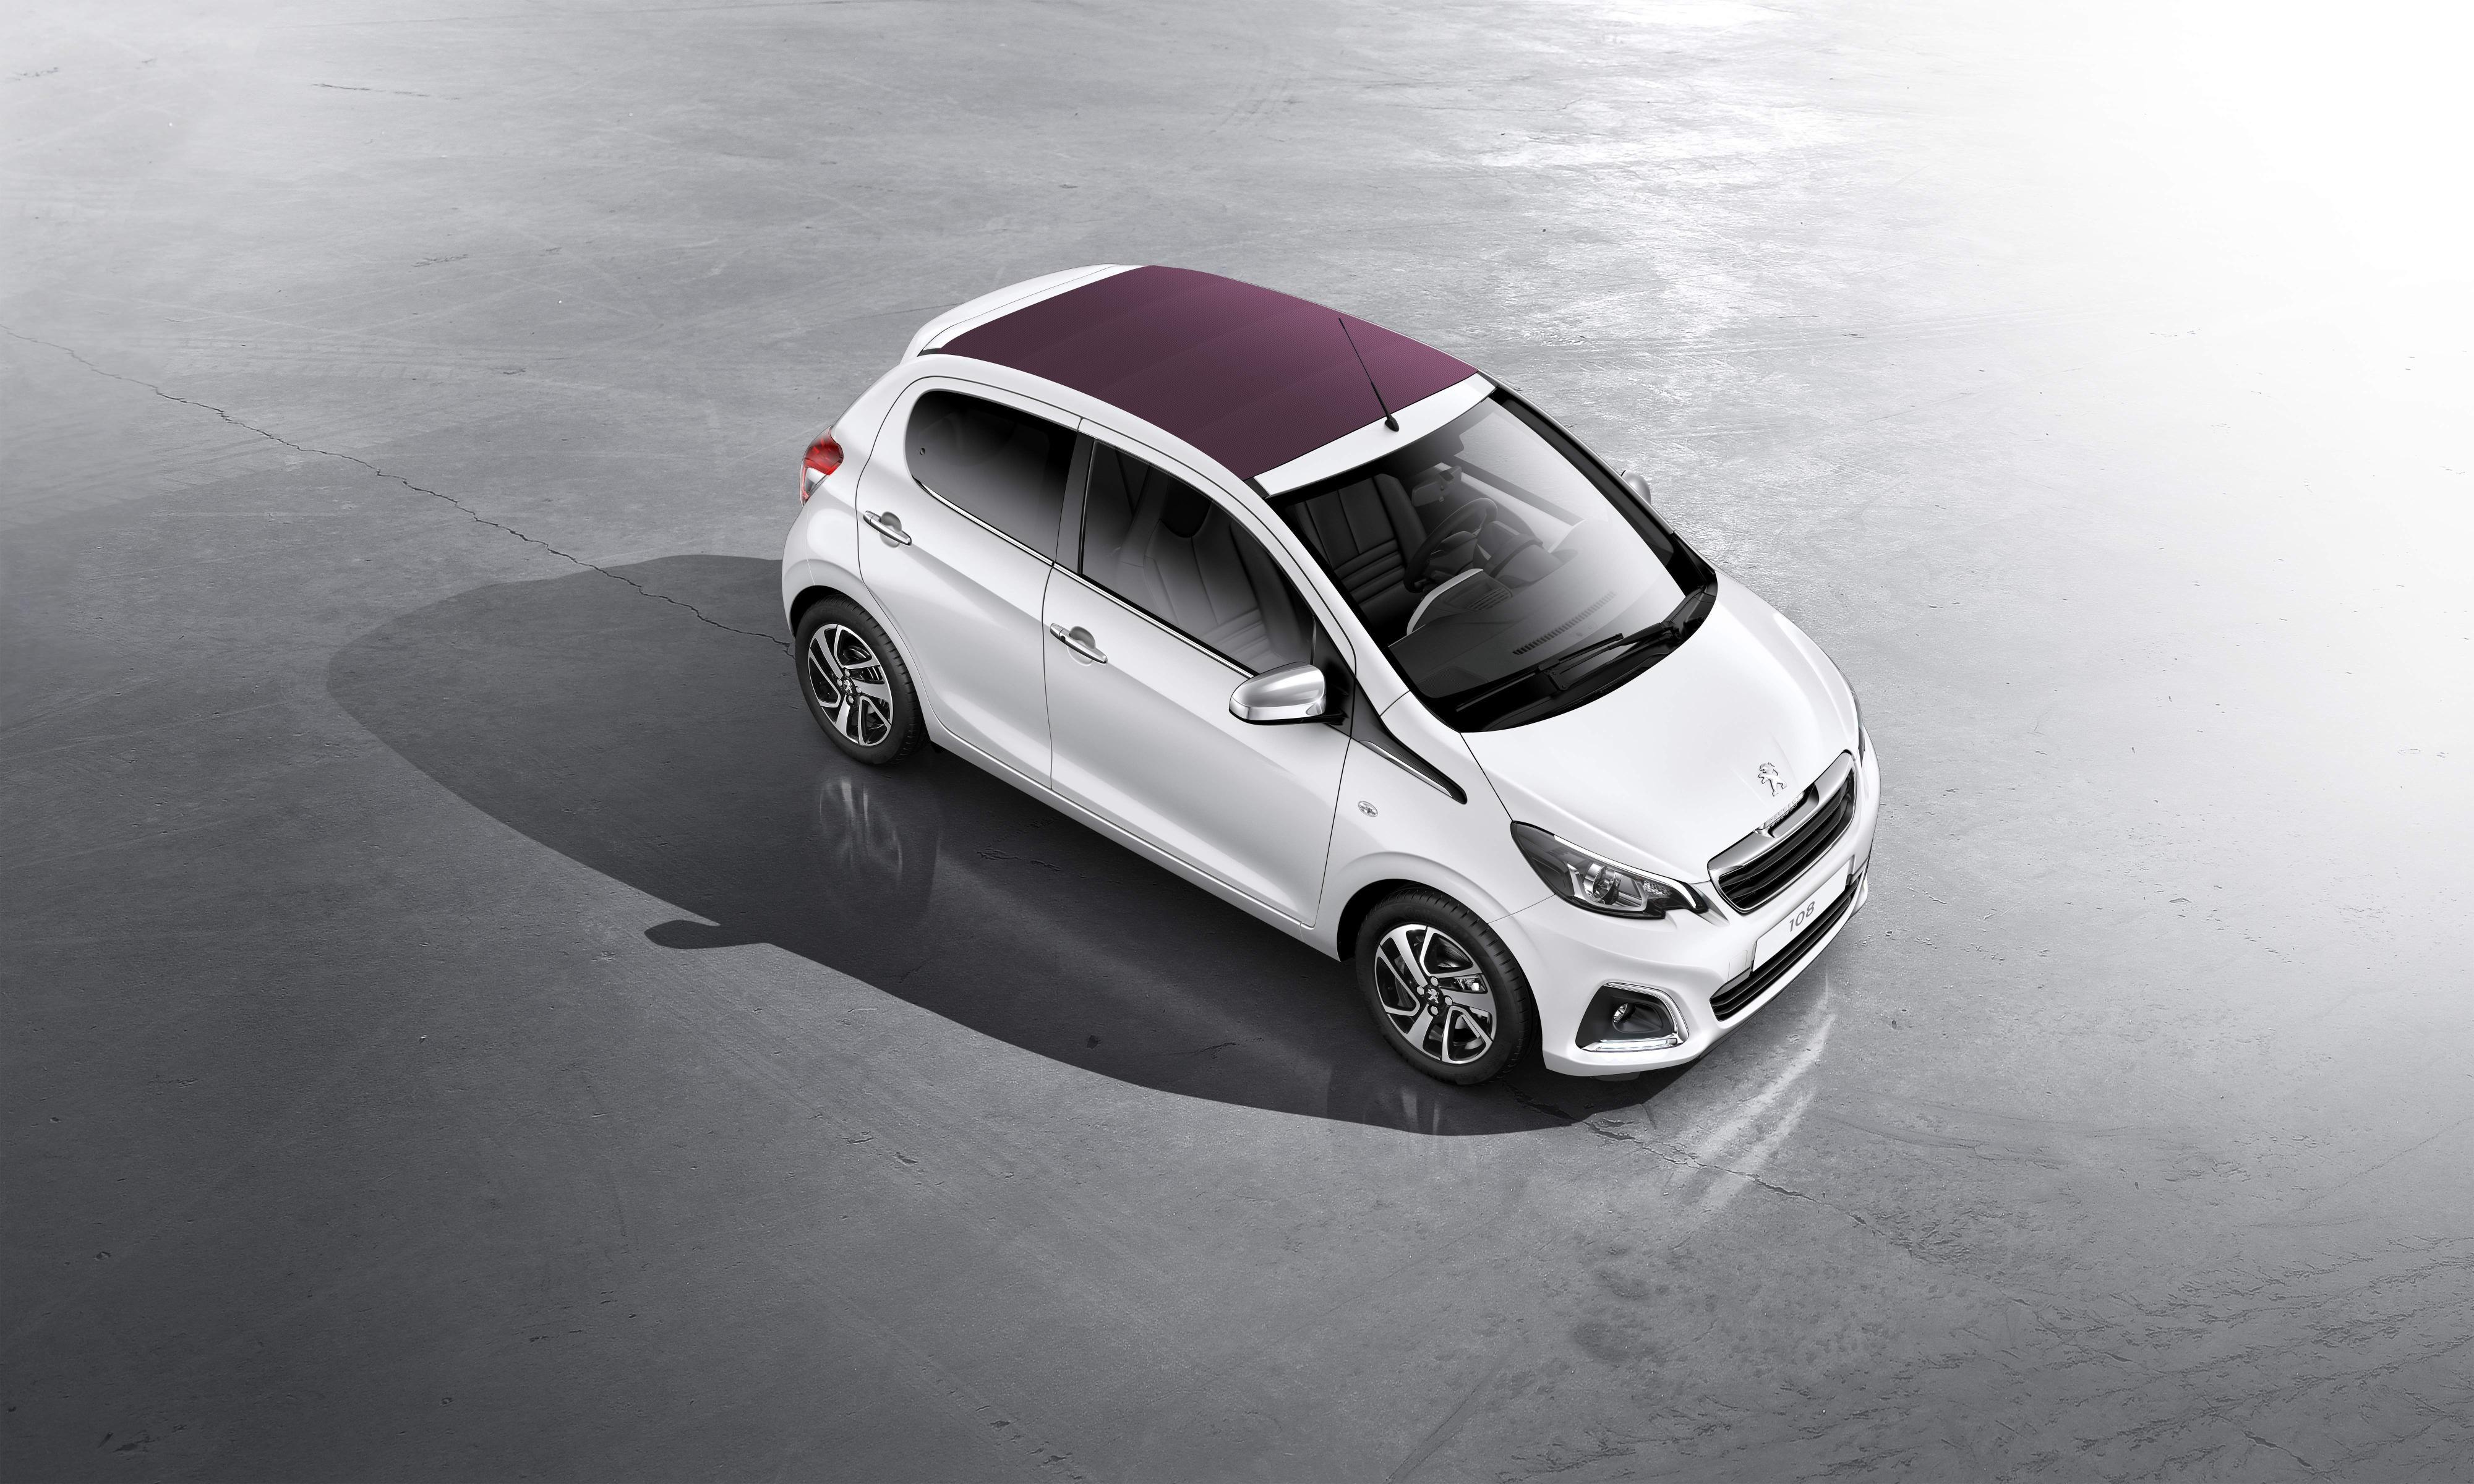 Jaki Bedzie Peugeot 108 Zdjecia City Car Car Peugeot